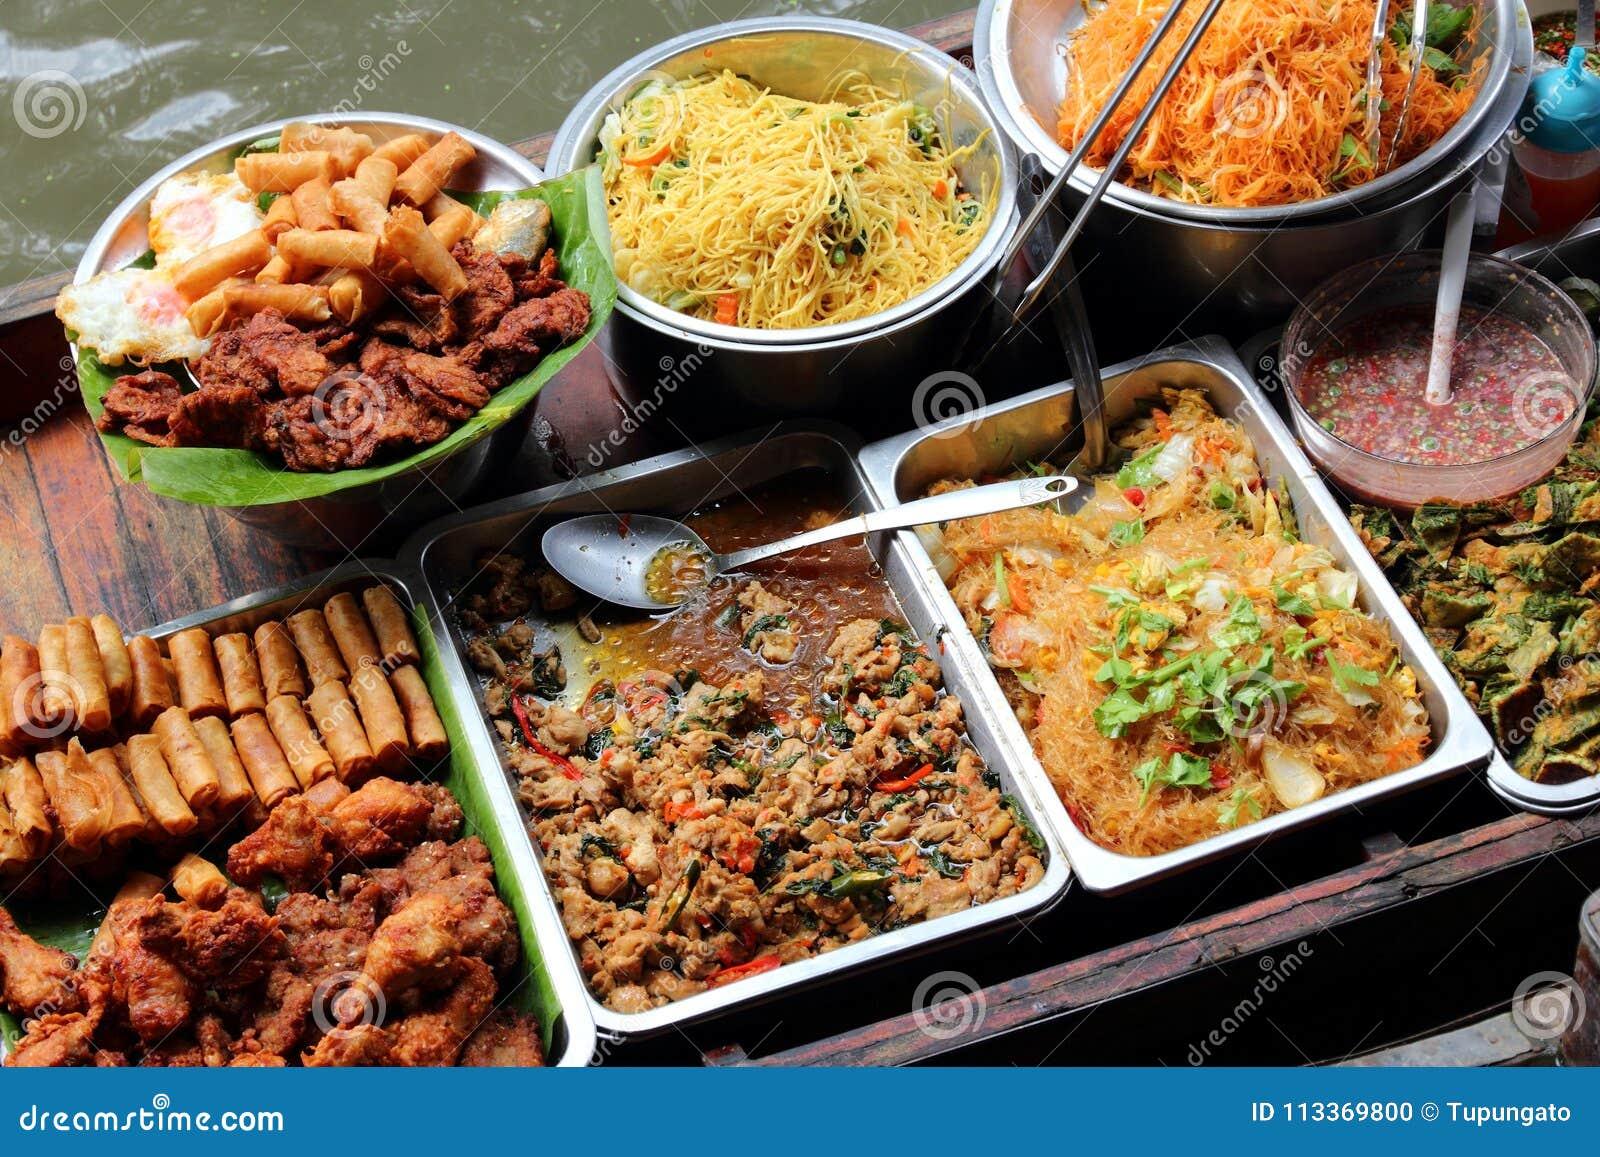 Thailändischer Lebensmittelverkäufer